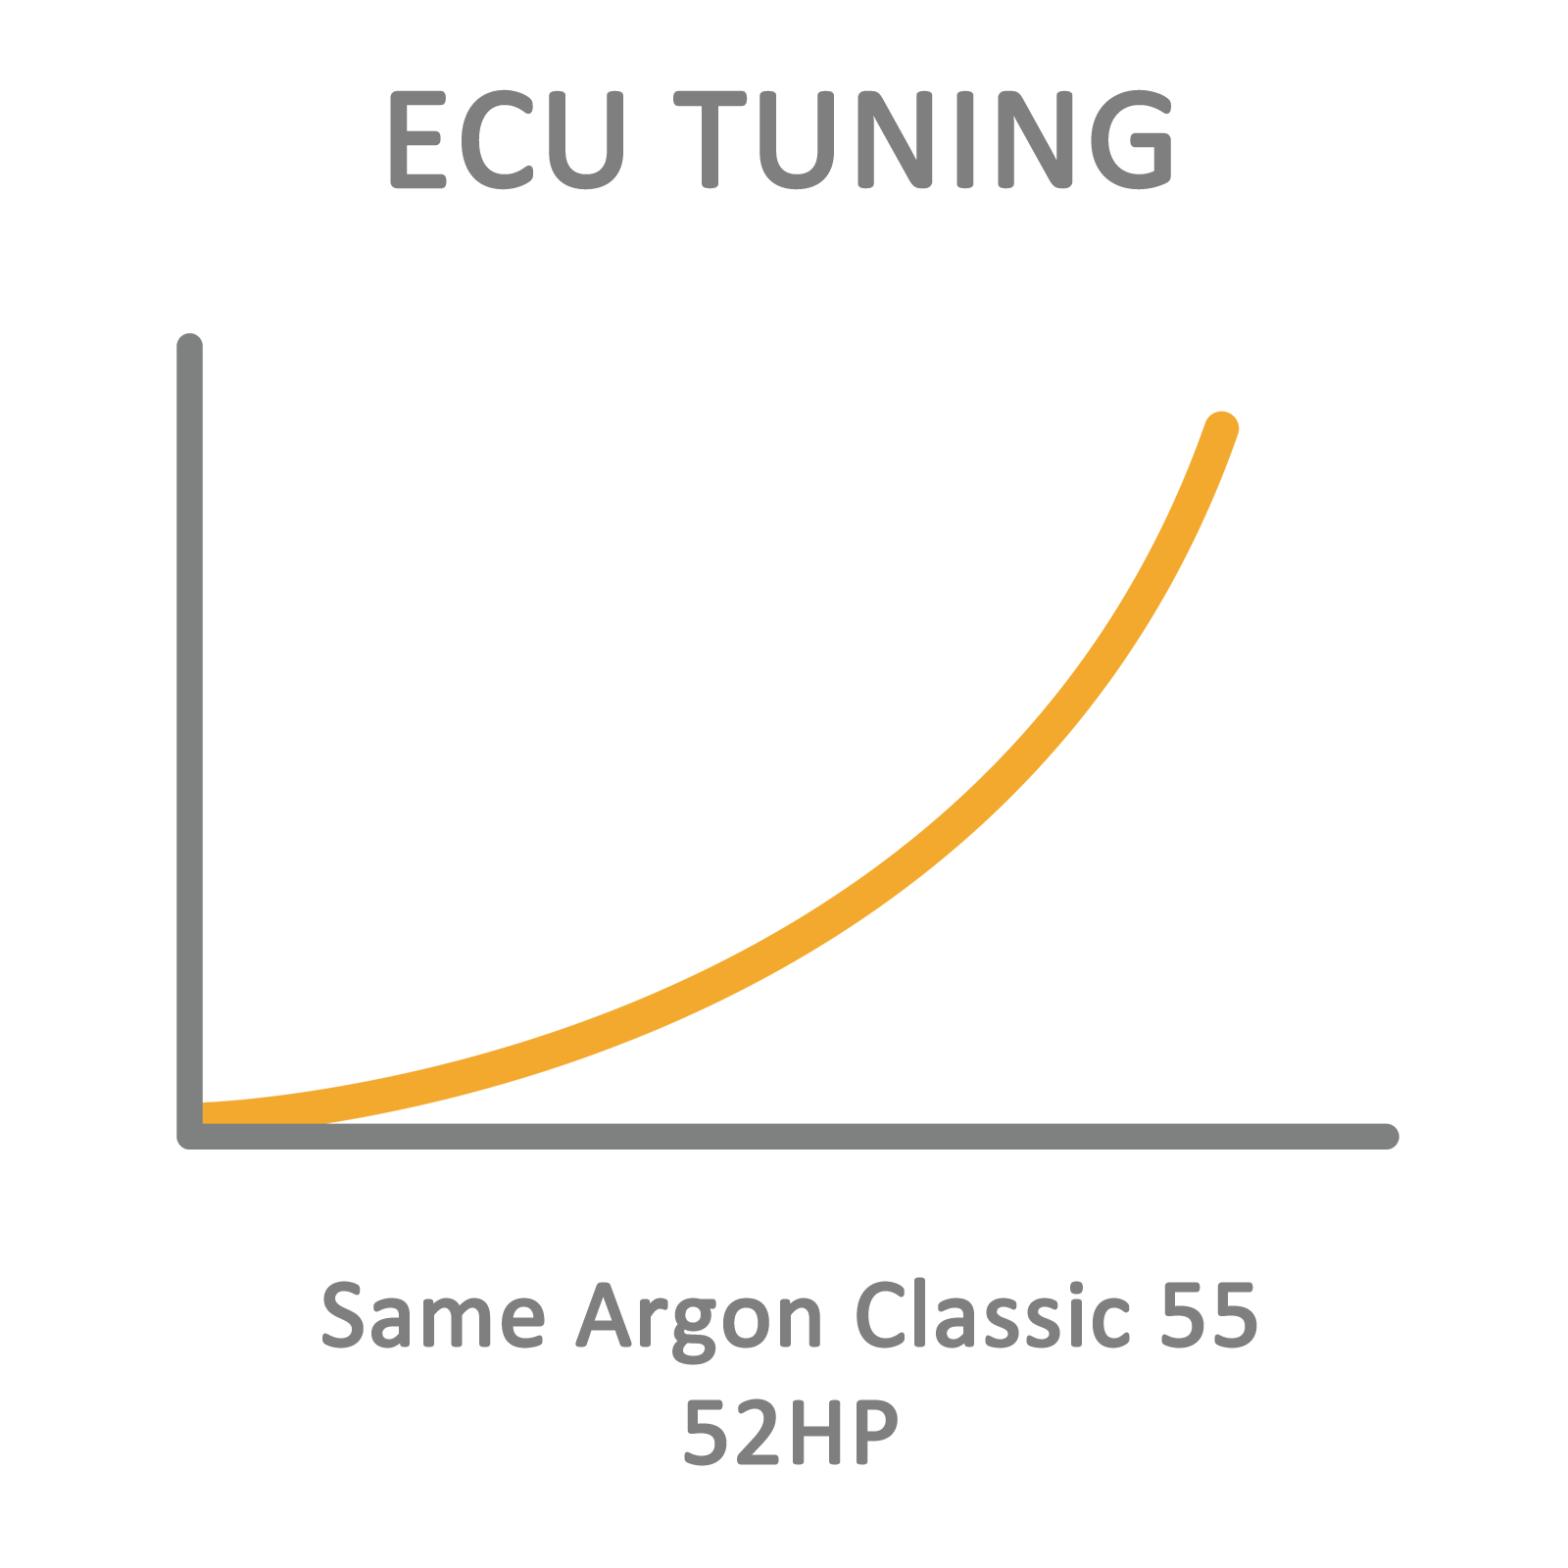 Same Argon Classic 55 52HP ECU Tuning Remapping Programming